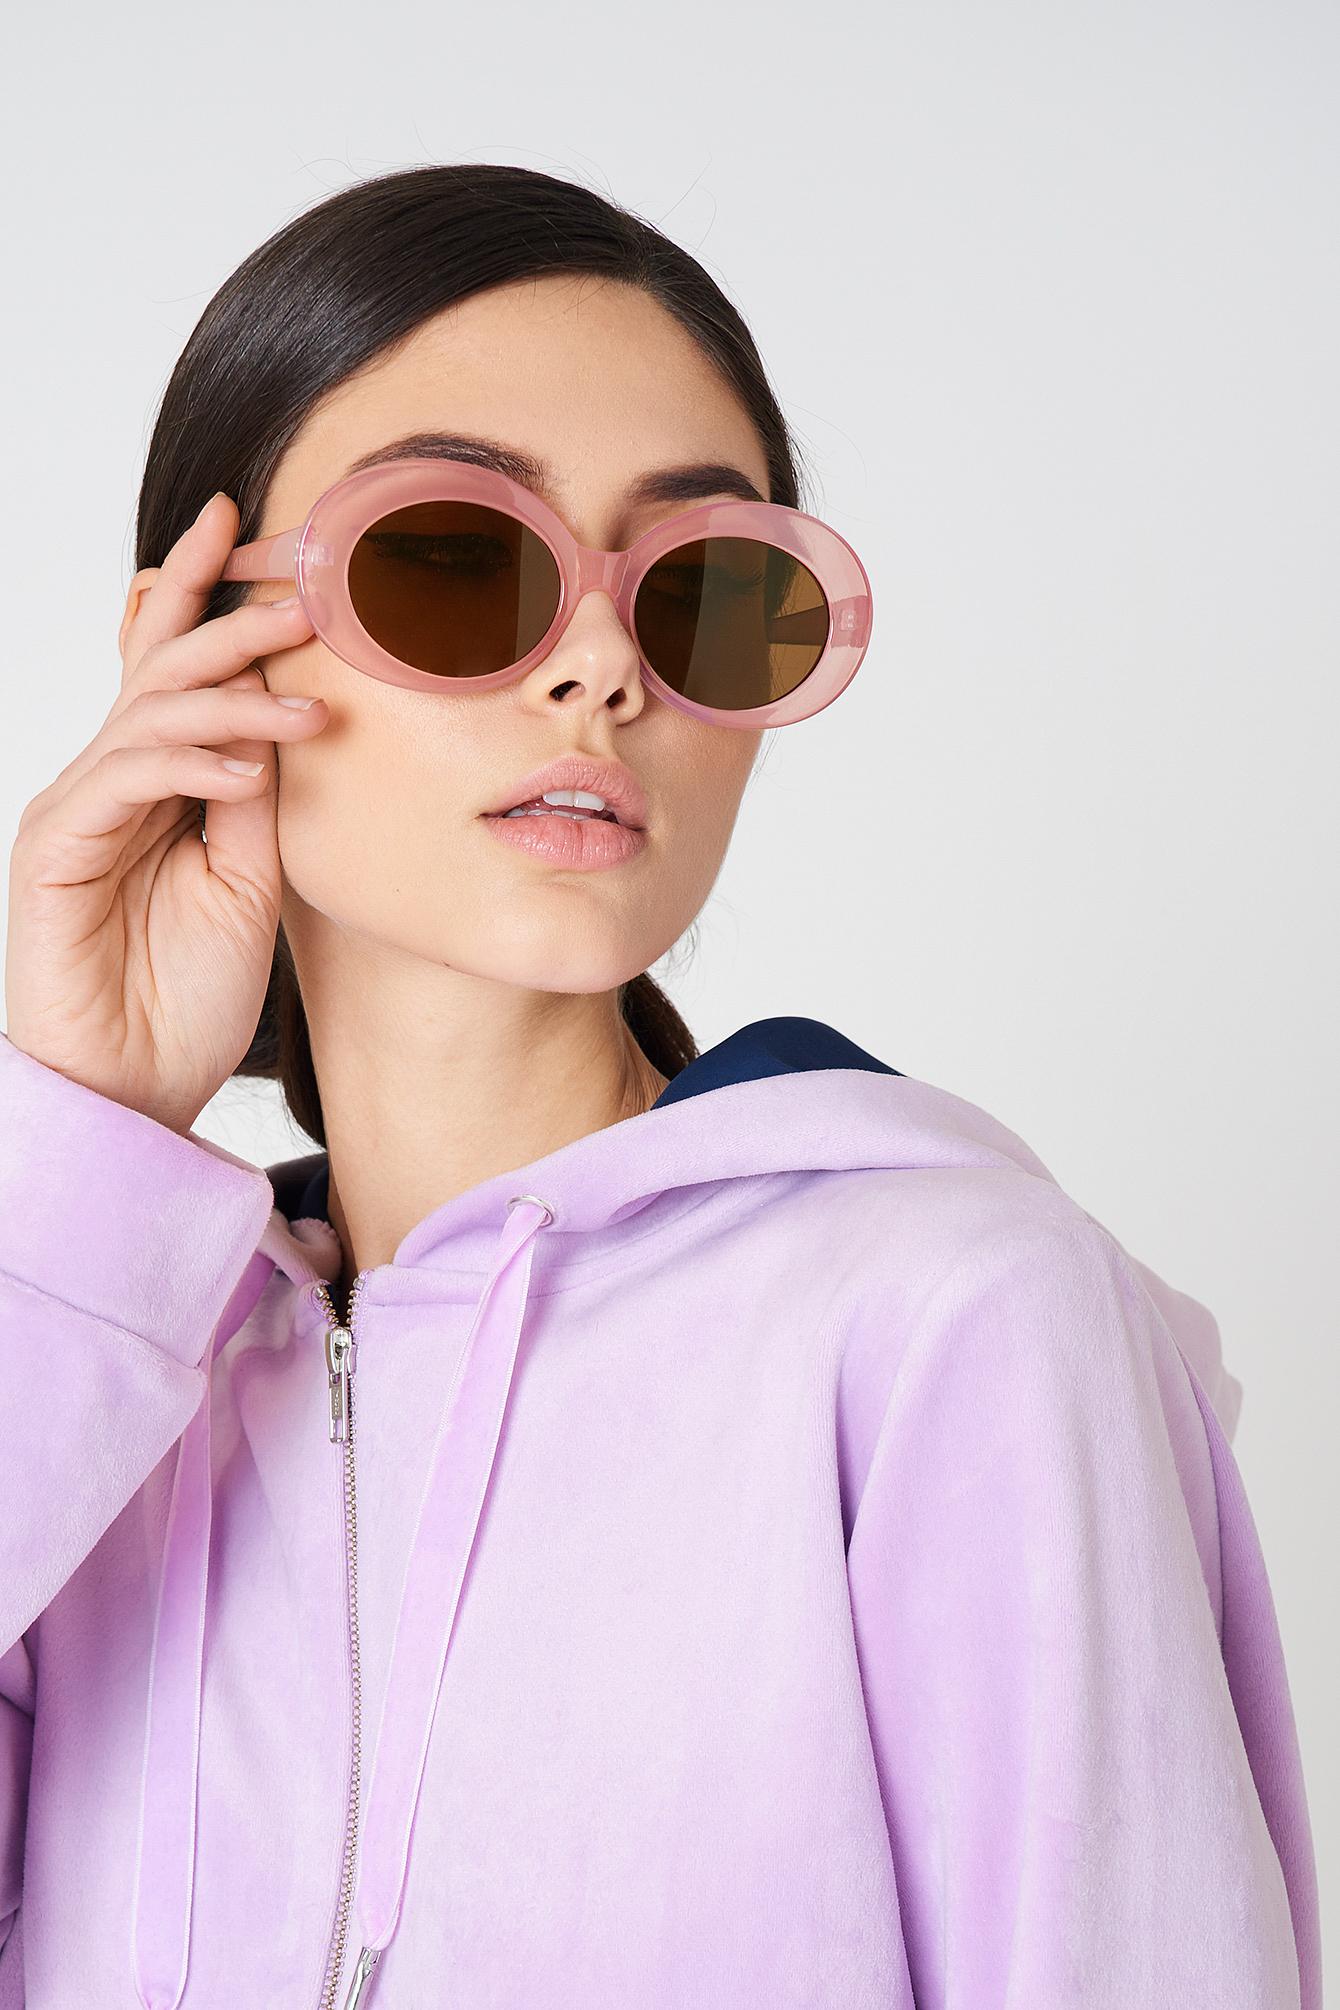 NA-KD Accessories Bubblegum Sunglasses - Pink HlN56Dwm